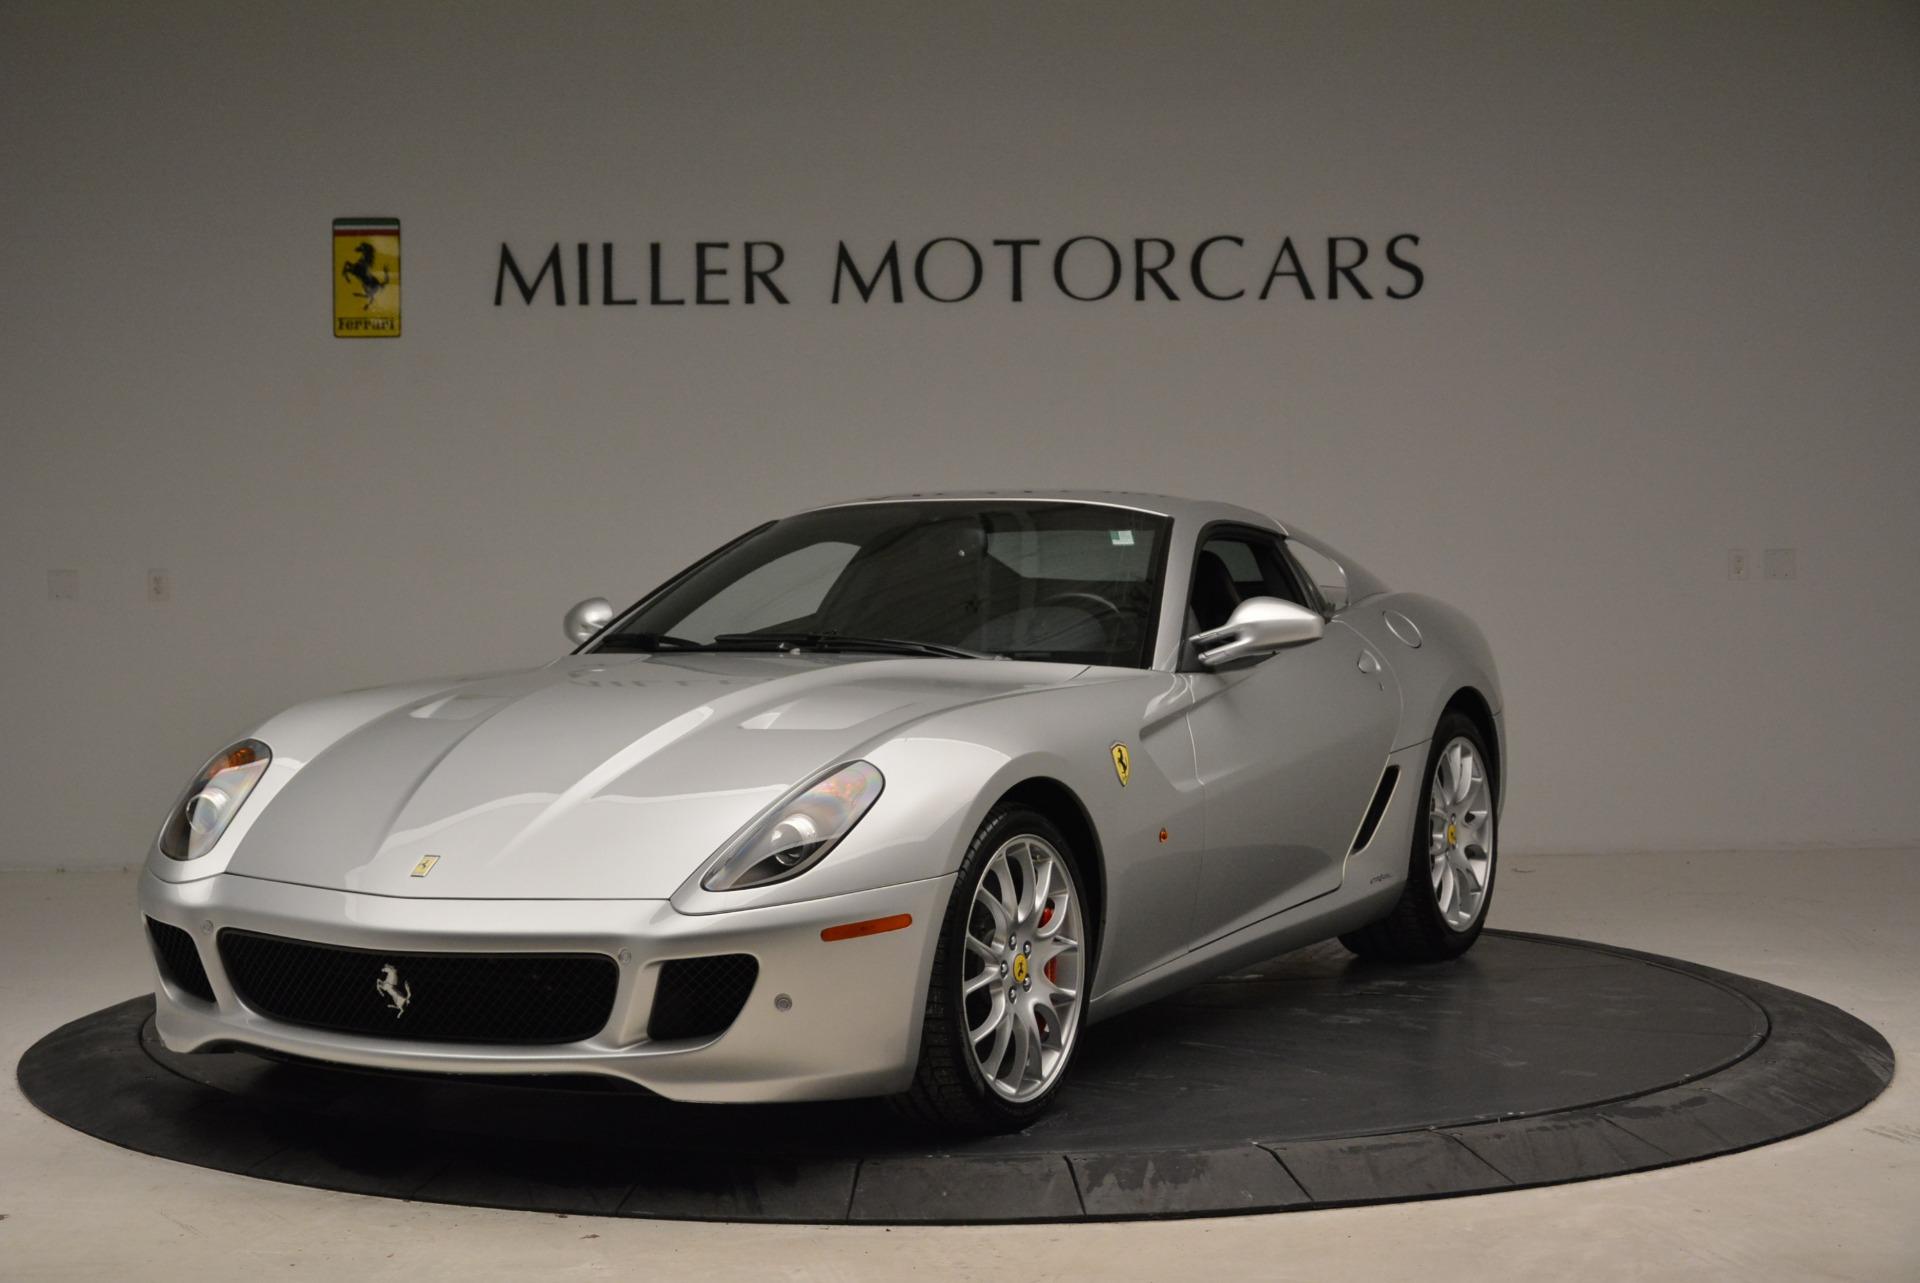 Used 2010 Ferrari 599 GTB Fiorano for sale Sold at Maserati of Westport in Westport CT 06880 1